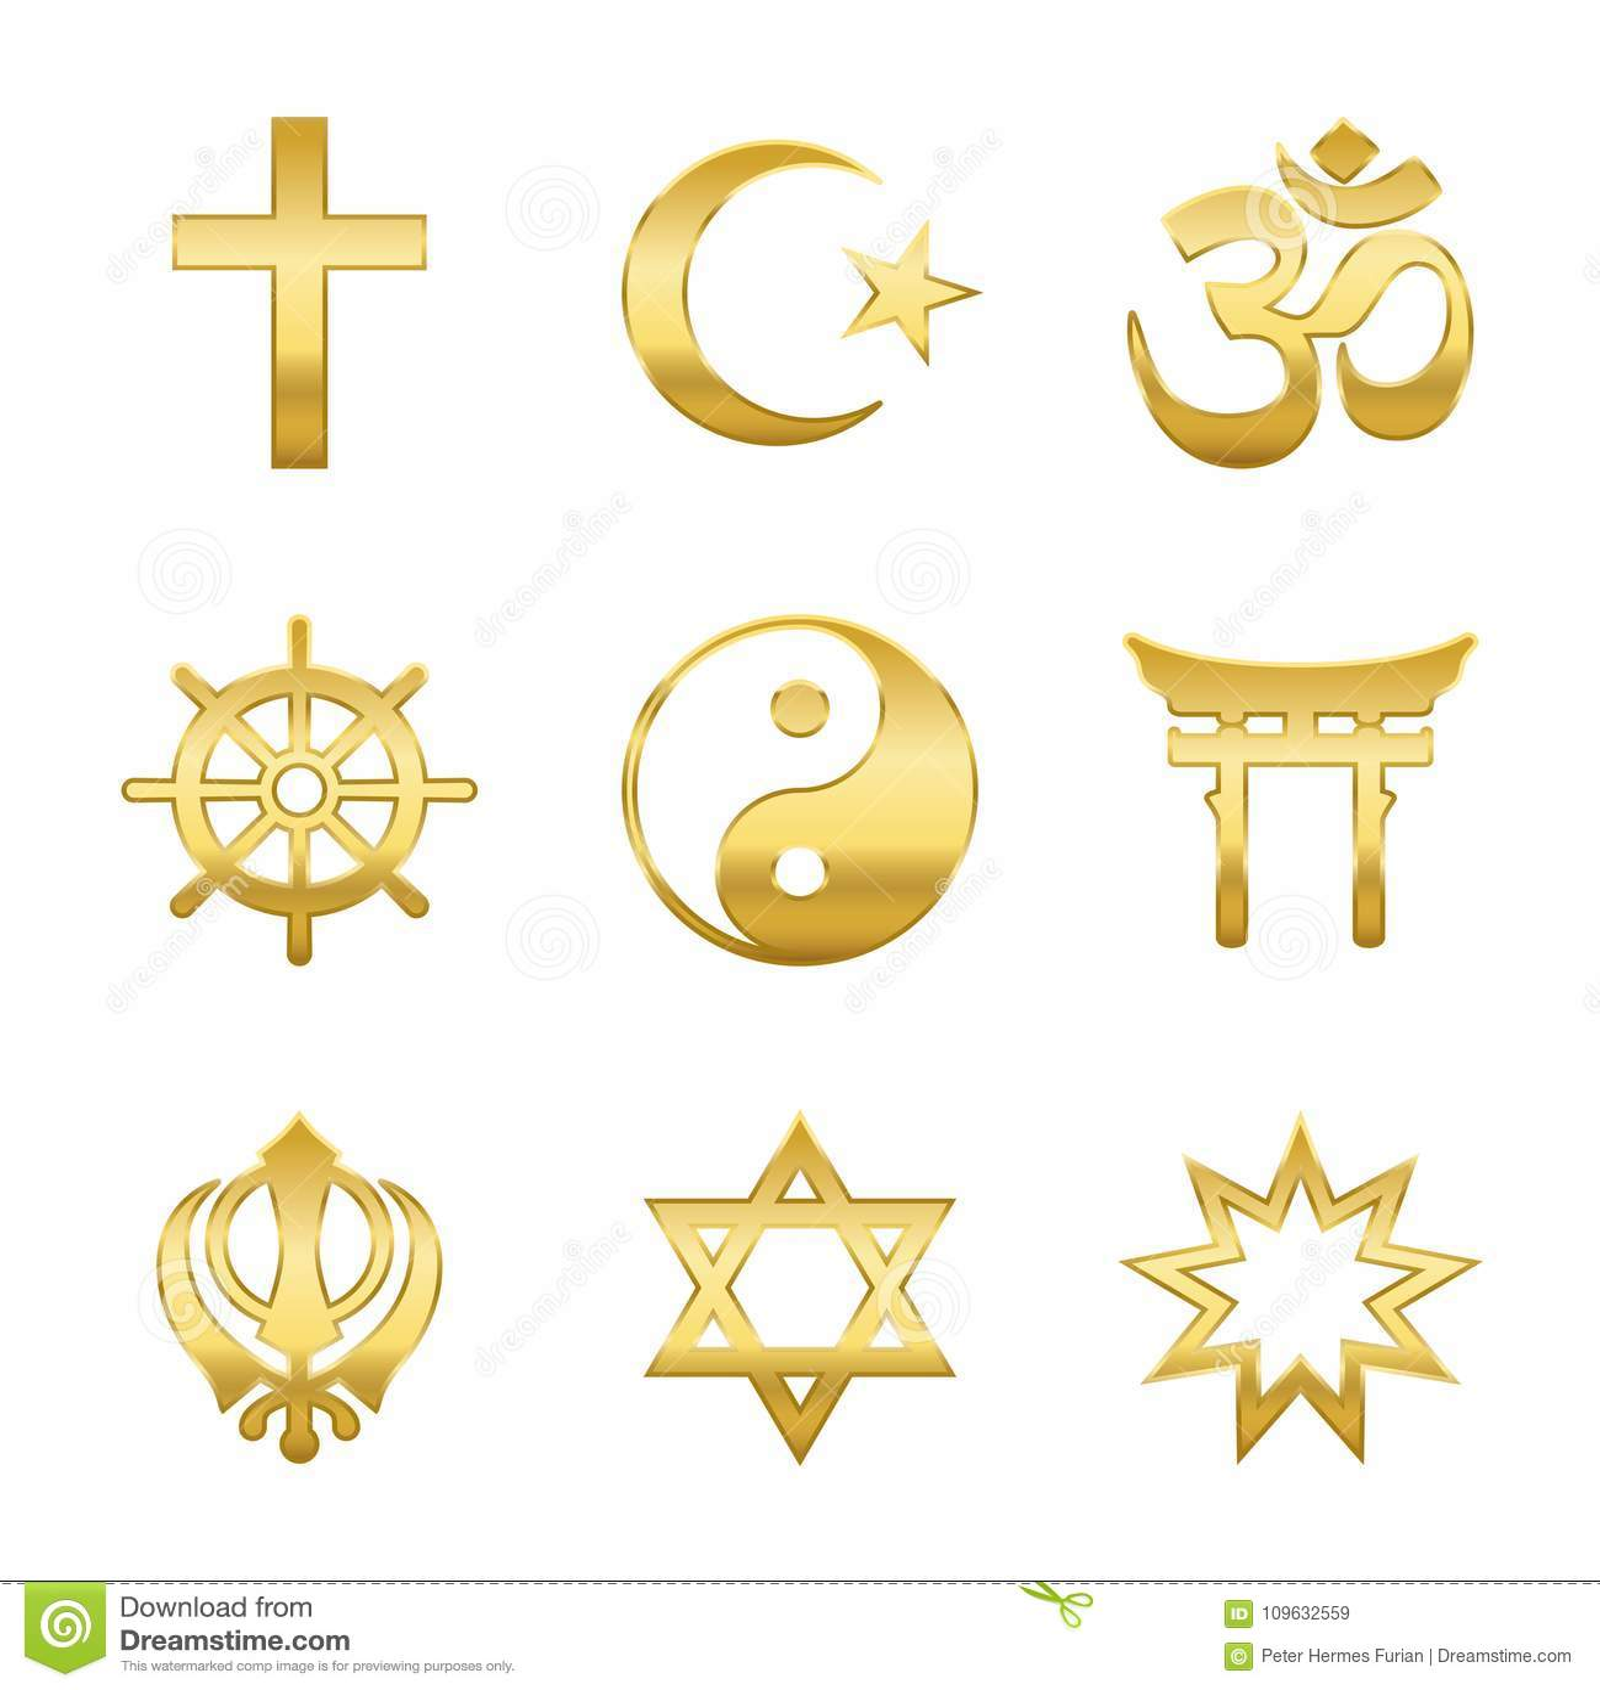 Golden Religious Symbols Stock Vector Illustration Of Pictogram